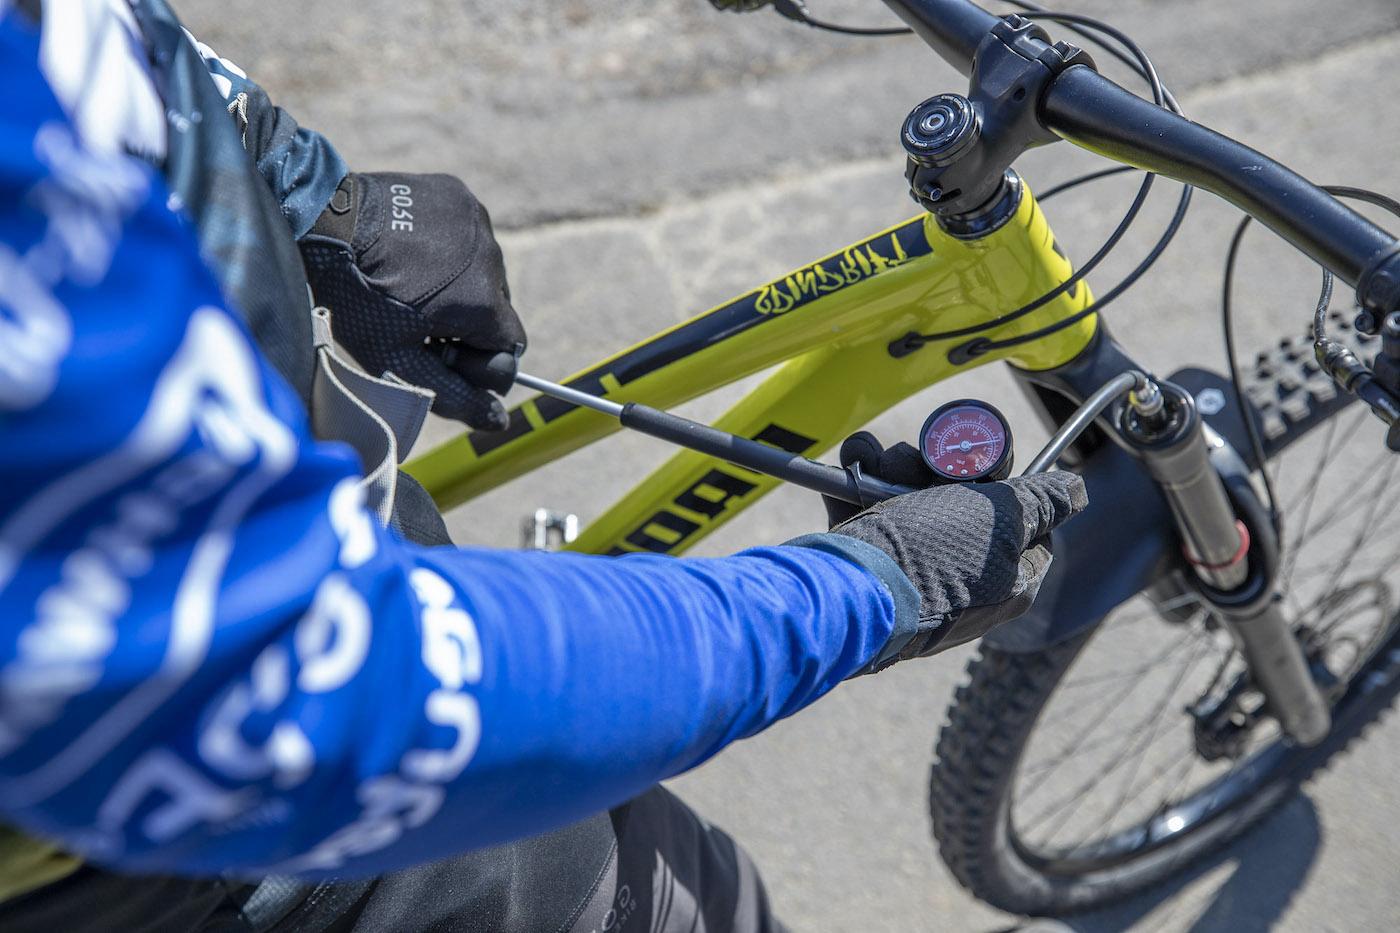 MTB Sprung & Drop Kurs in Pforzheim - Fahrtechnik Training Rock my Trail Bikeschule GmbH